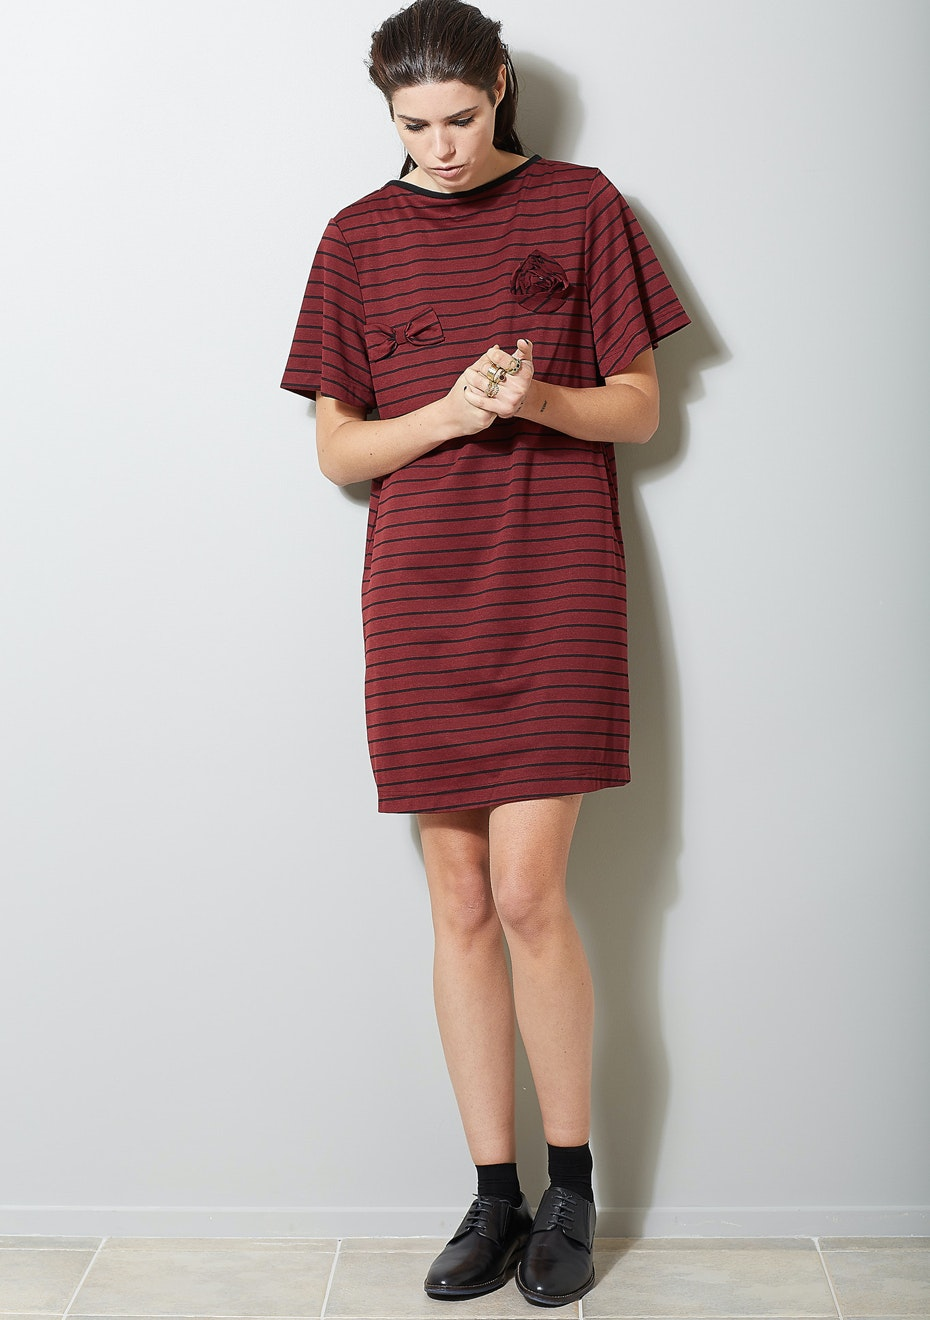 Salasai - Rosette T Dress - Burgundy Stripe